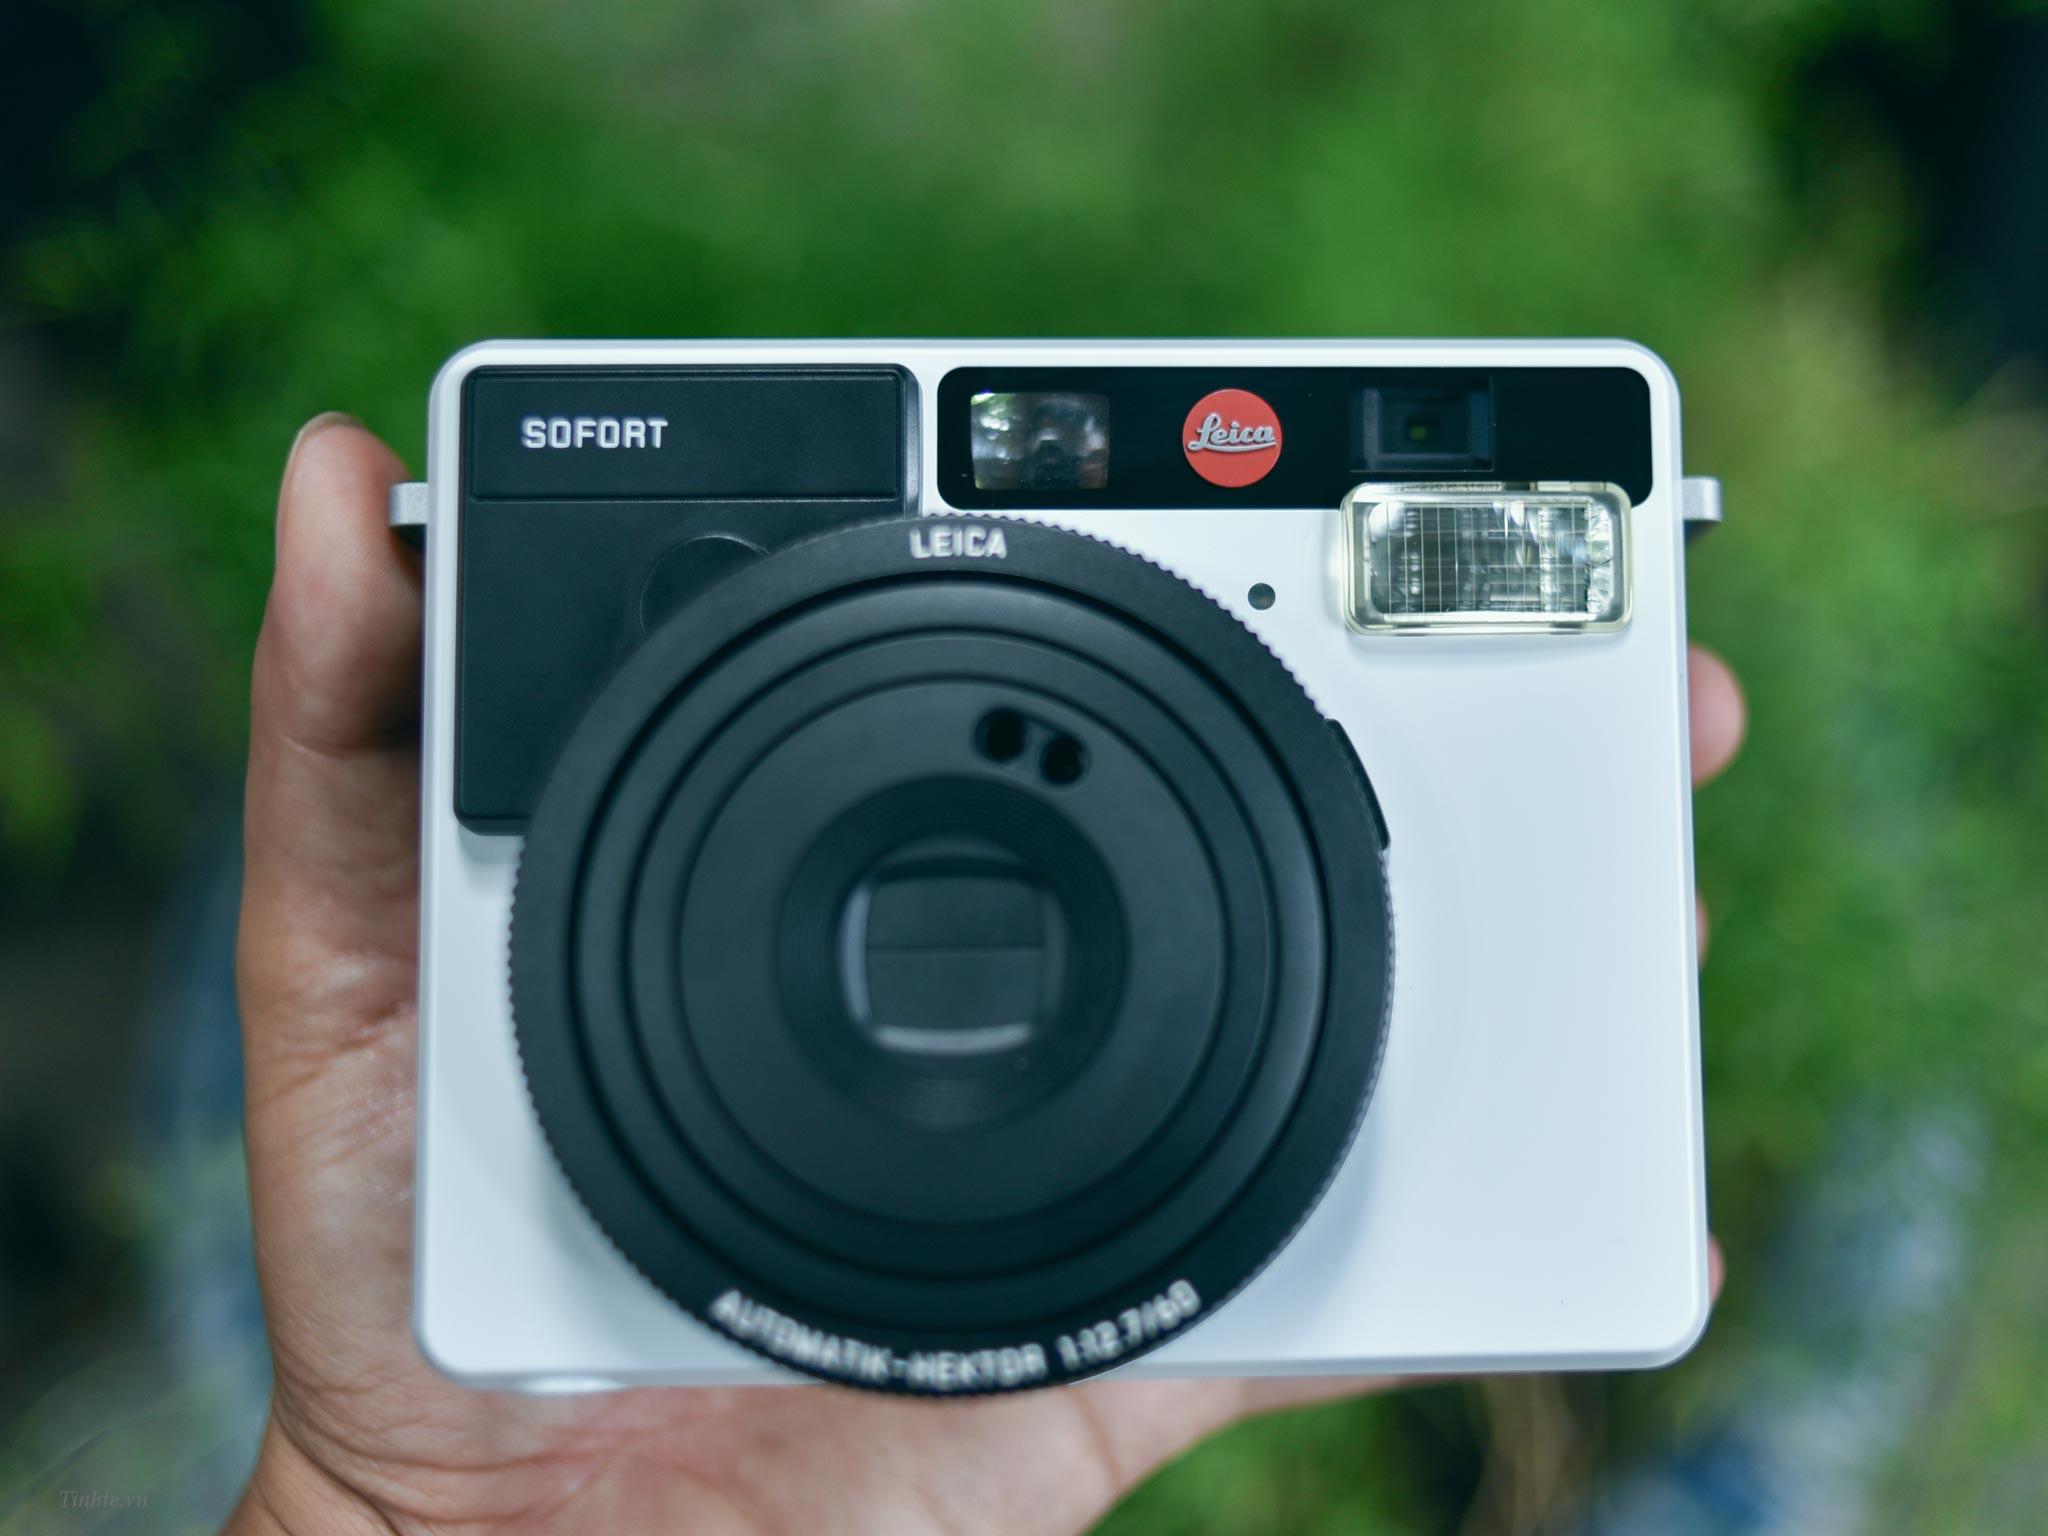 Leica_Sofort_camera.tinhte.vn_36.jpg